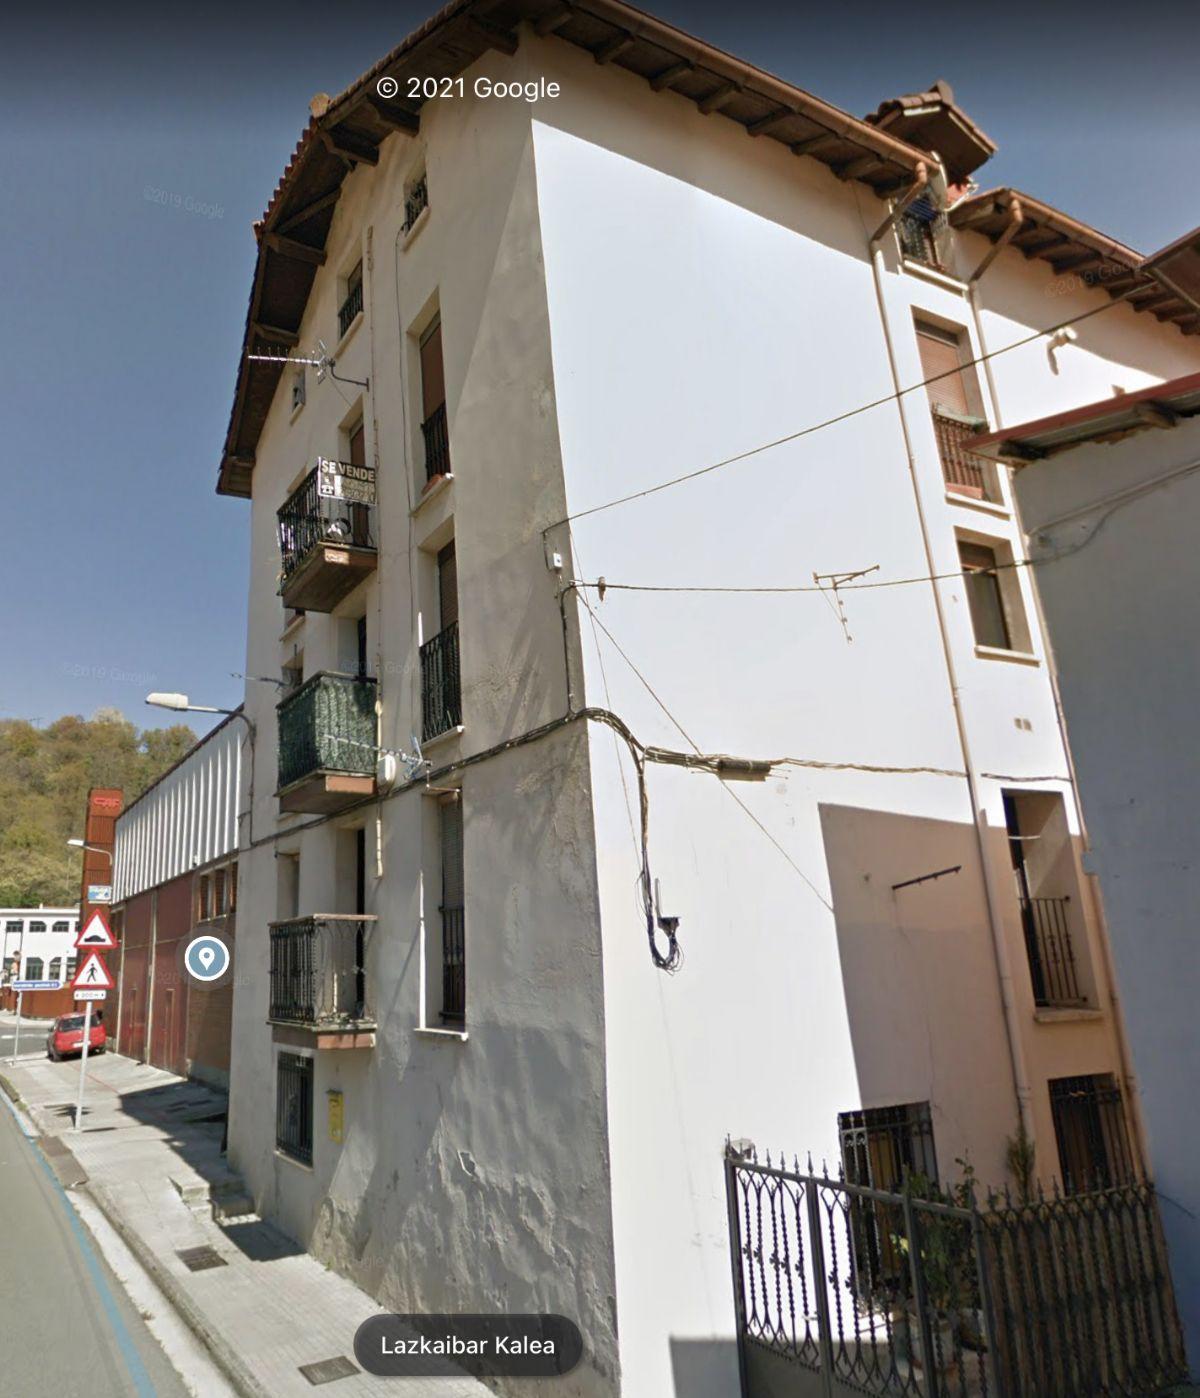 Piso en venta en Beasain, Guipúzcoa, Calle Lazkaibar Kalea, 75.300 €, 2 habitaciones, 1 baño, 113 m2